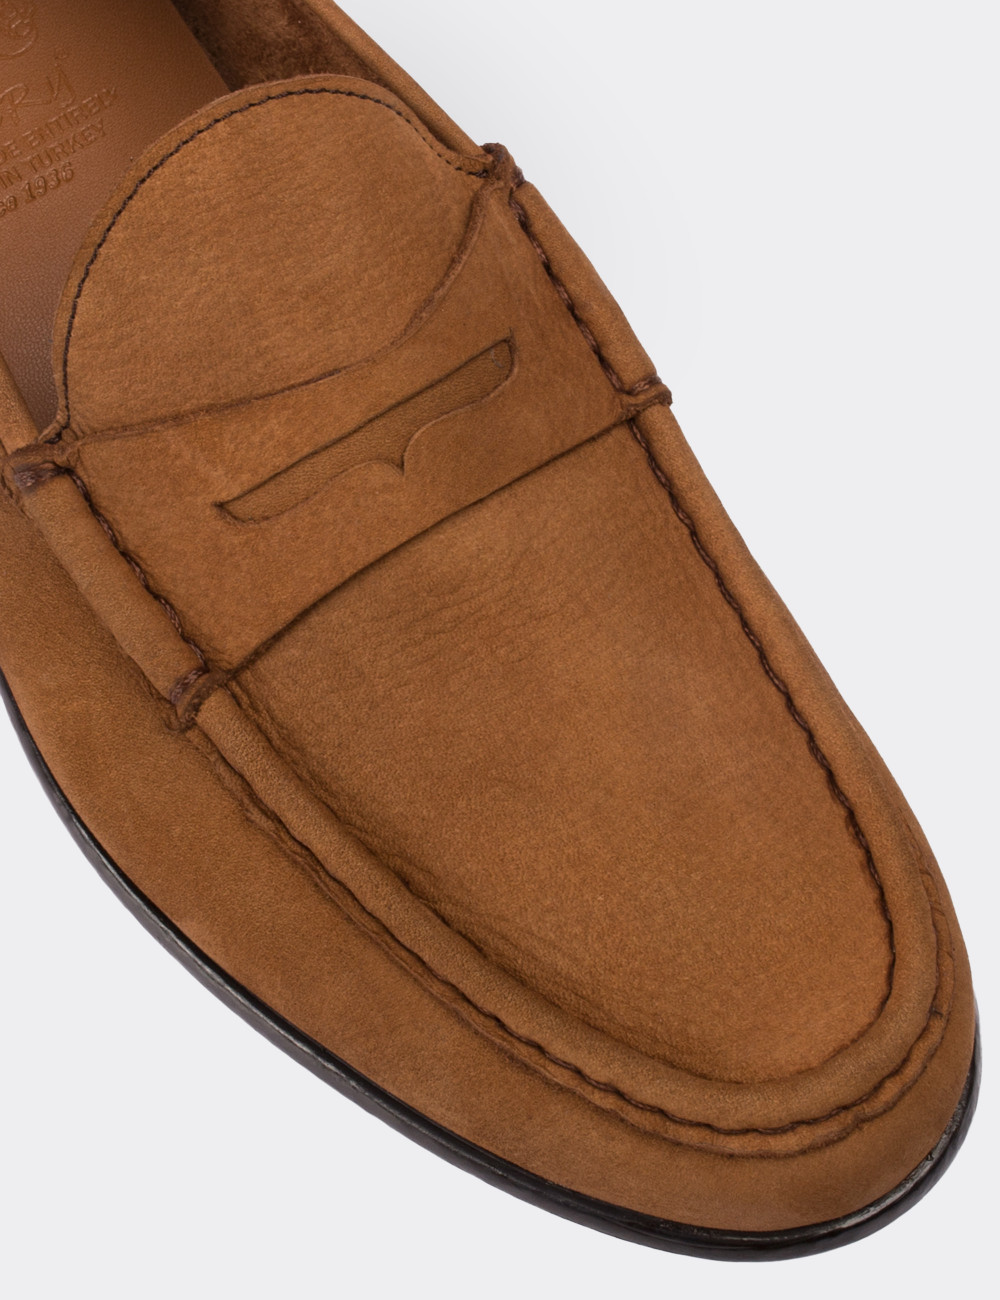 Hakiki Nubuk Taba Rengi Loafer Erkek Ayakkabı - 01648MTBAC01